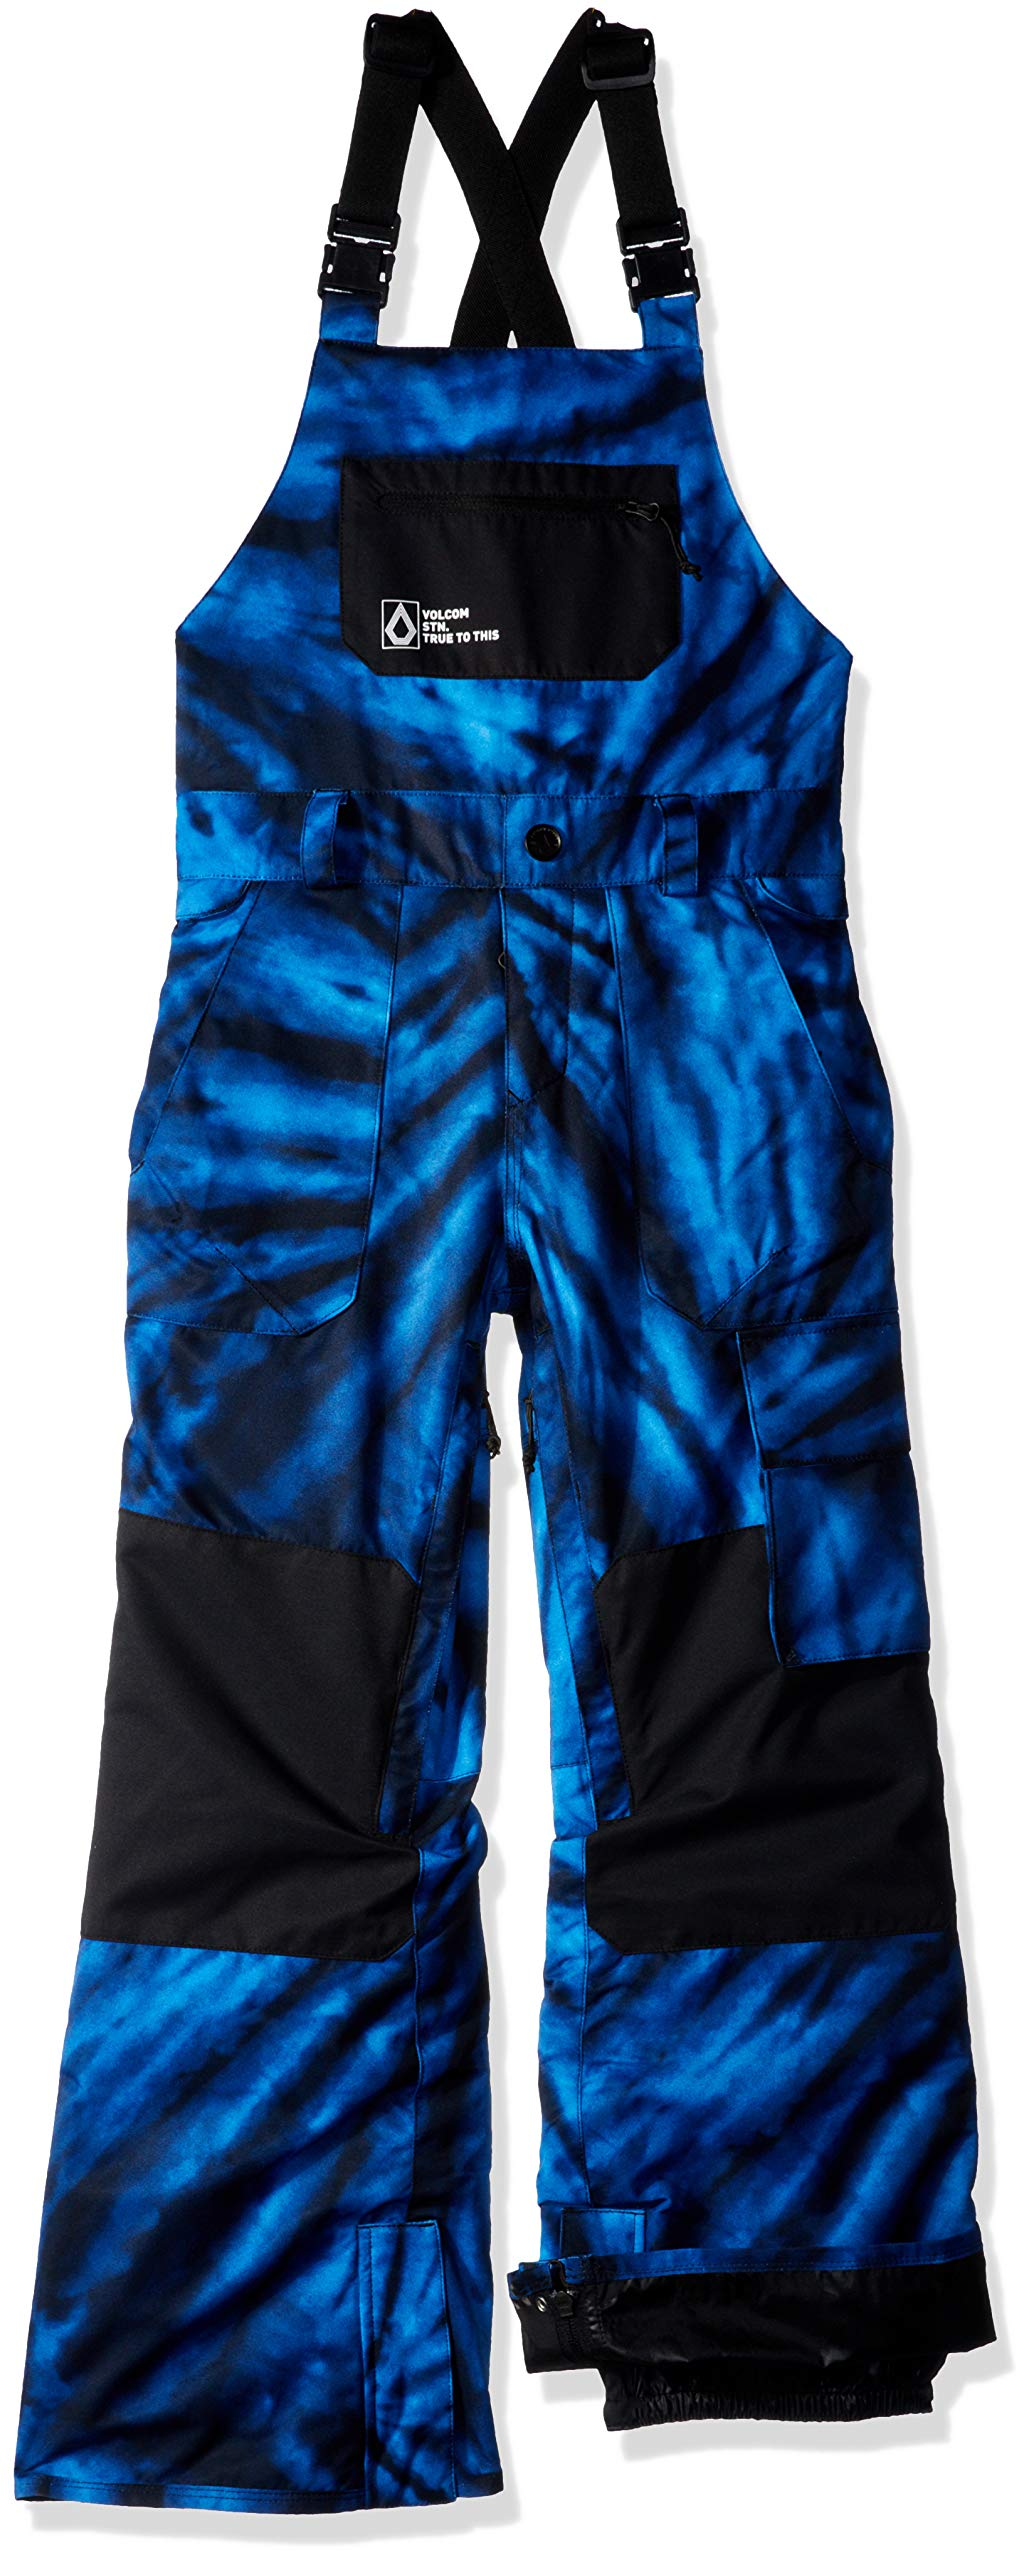 Volcom Boys' Big Barkley 2 Layer Shell Bib Snow Overall, Blue tie/dye, Extra Large